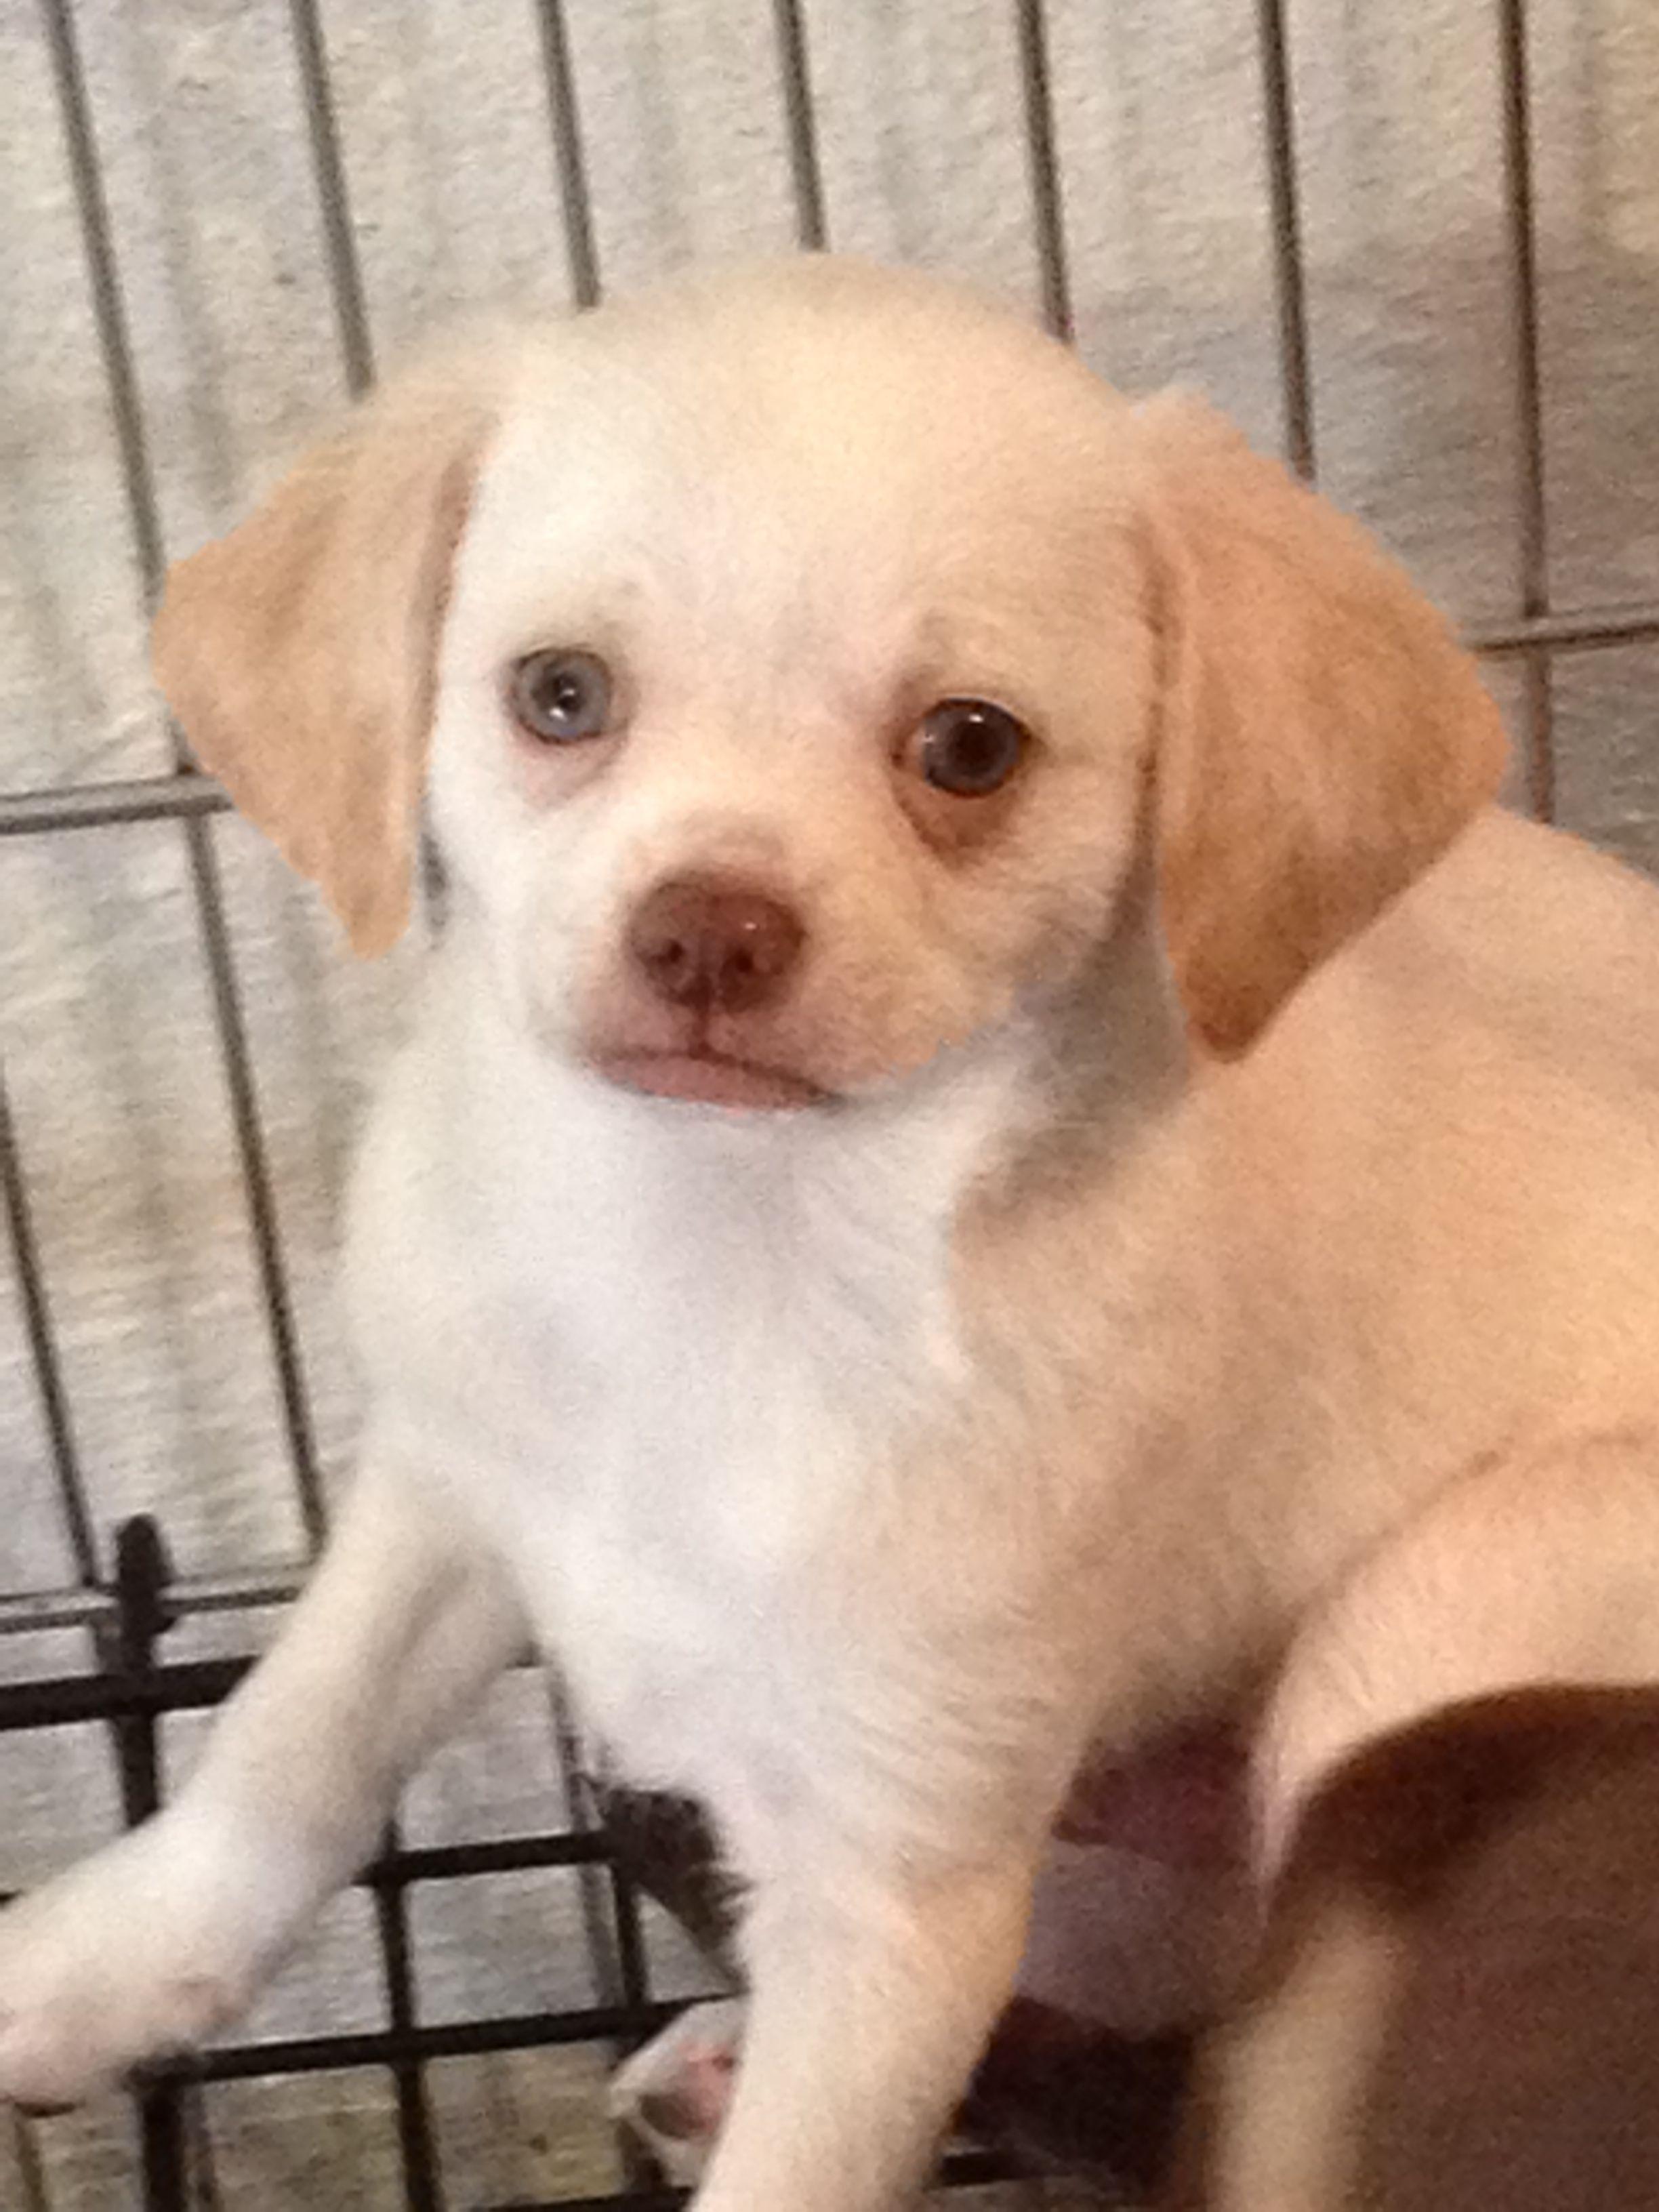 White Male Spaniel puppies for sale, Cocker spaniel